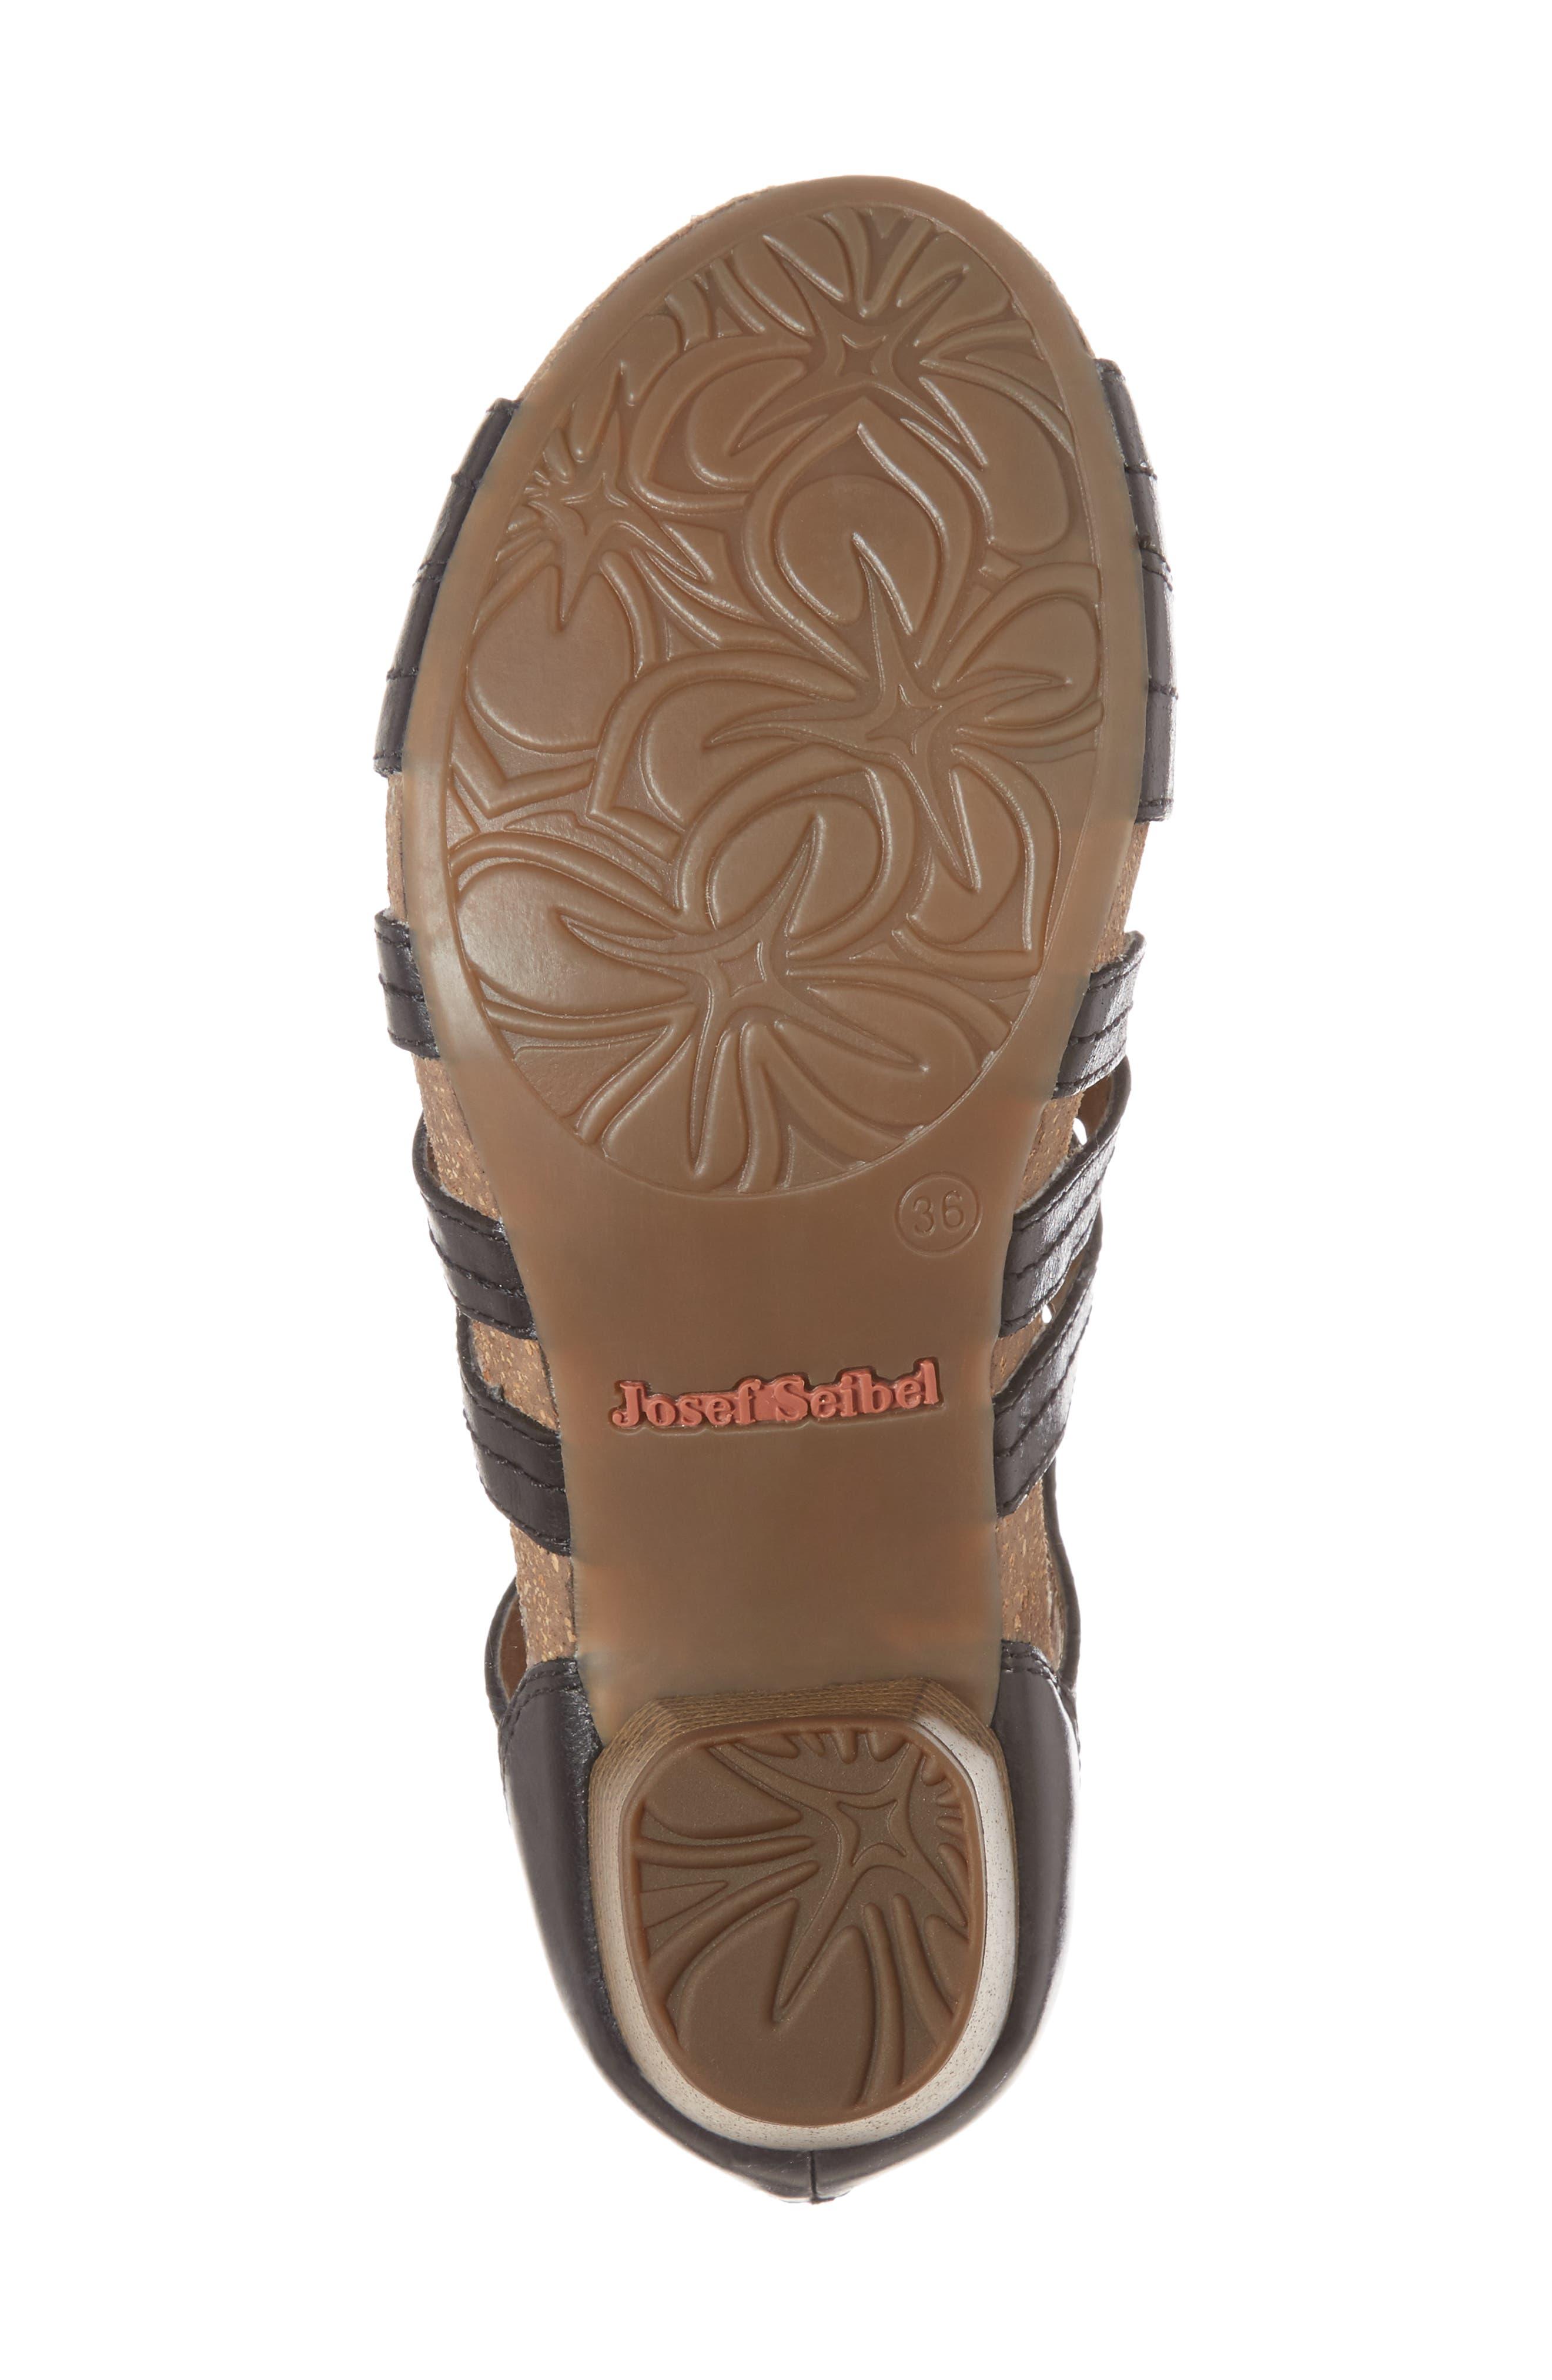 Rose 21 Gladiator Sandal,                             Alternate thumbnail 6, color,                             BLACK LEATHER